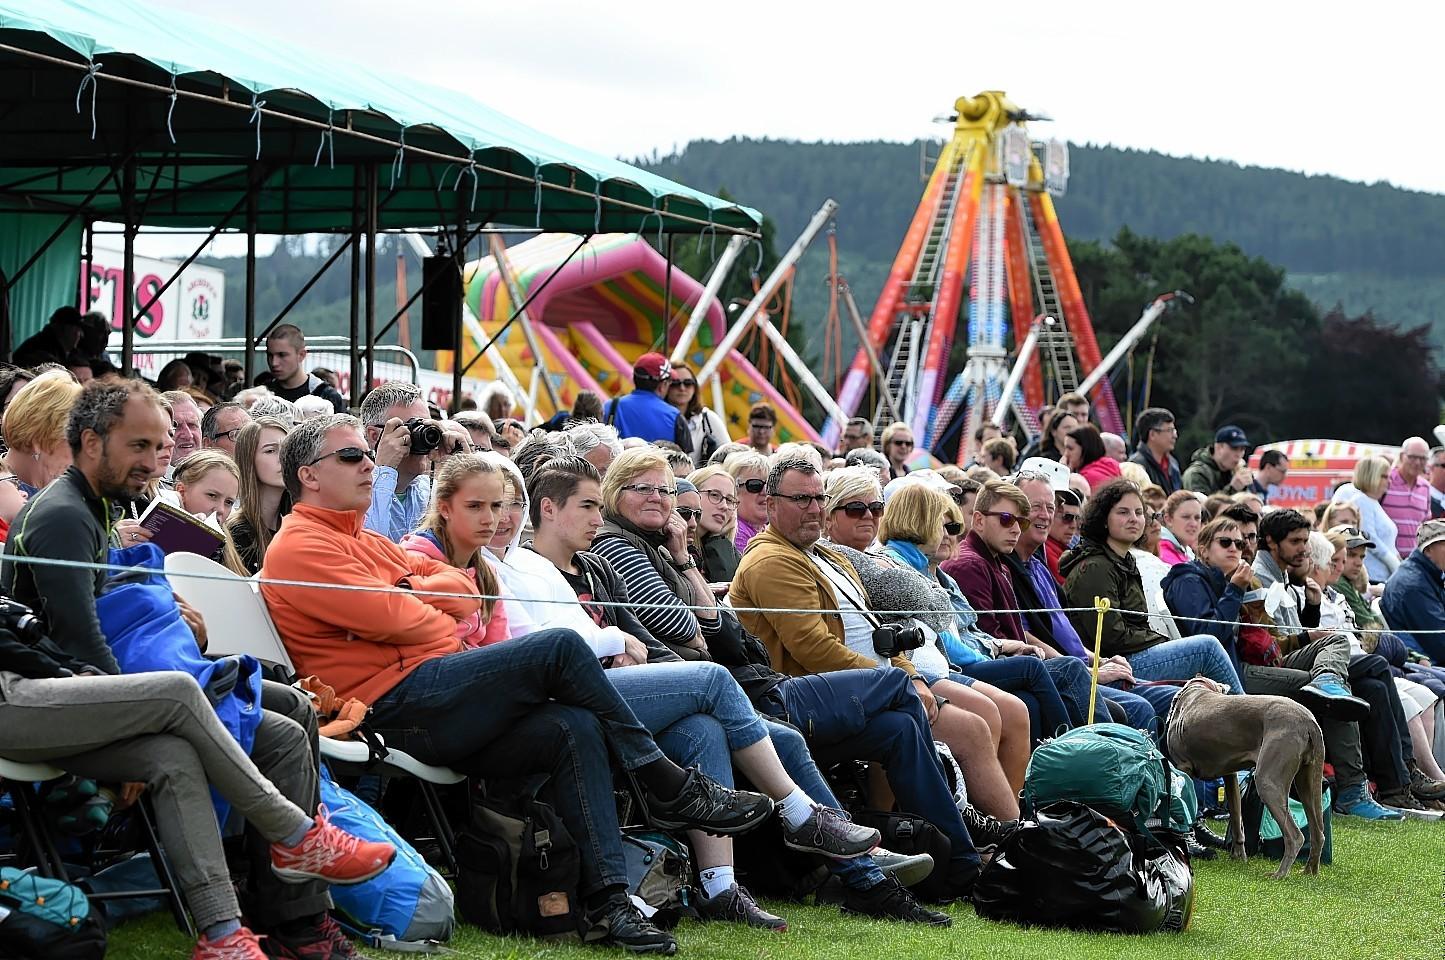 Crowd at Aboyne Highland Games. Credit: Kenny Elrick.